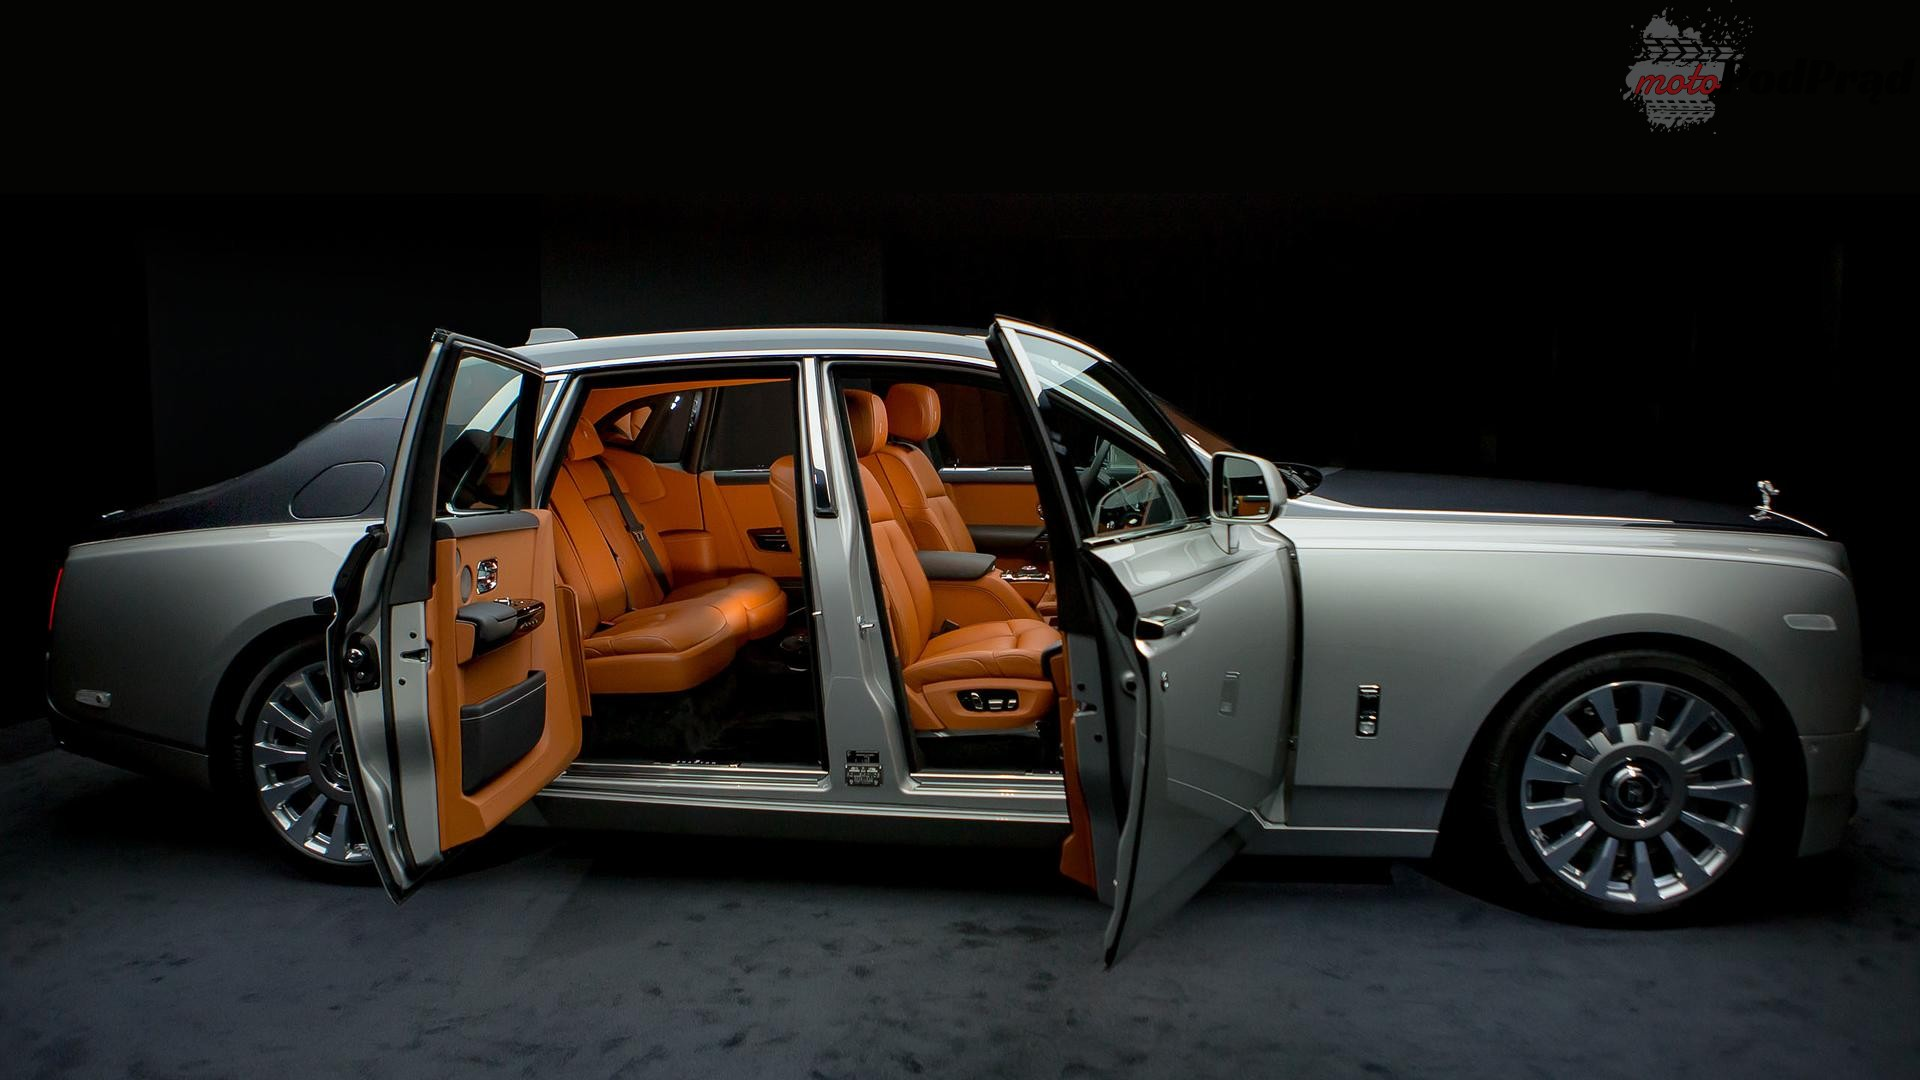 2018 rolls royce phantom 1 Rolls Royce Phantom: czysta dominacja